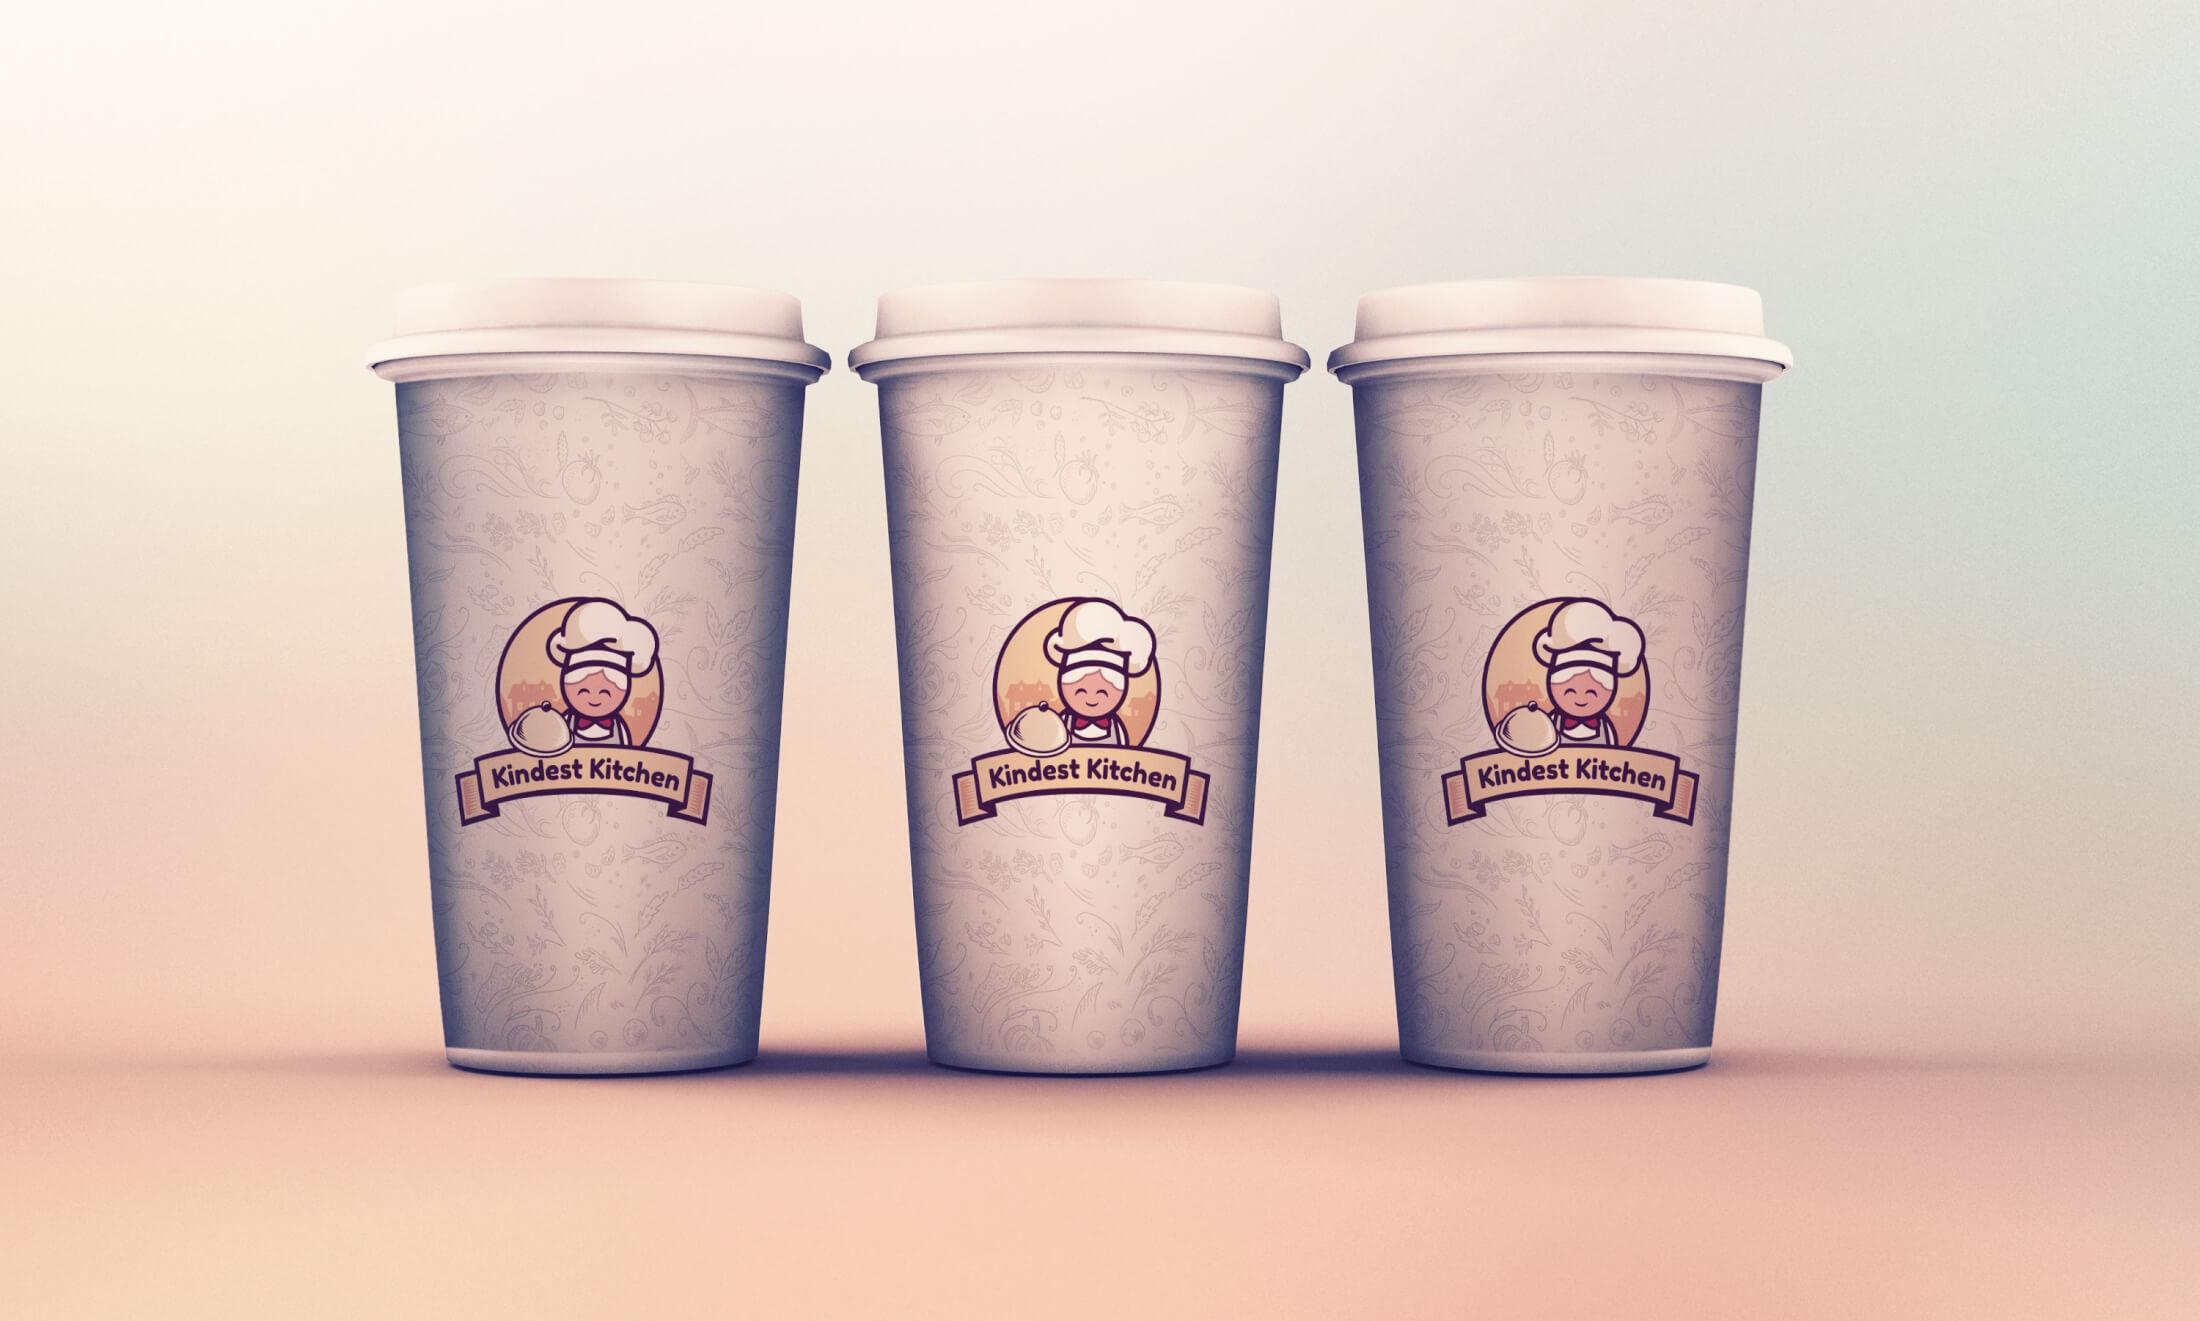 Restaurant logo design by europe graphics. Food company logo design. Coffe cups